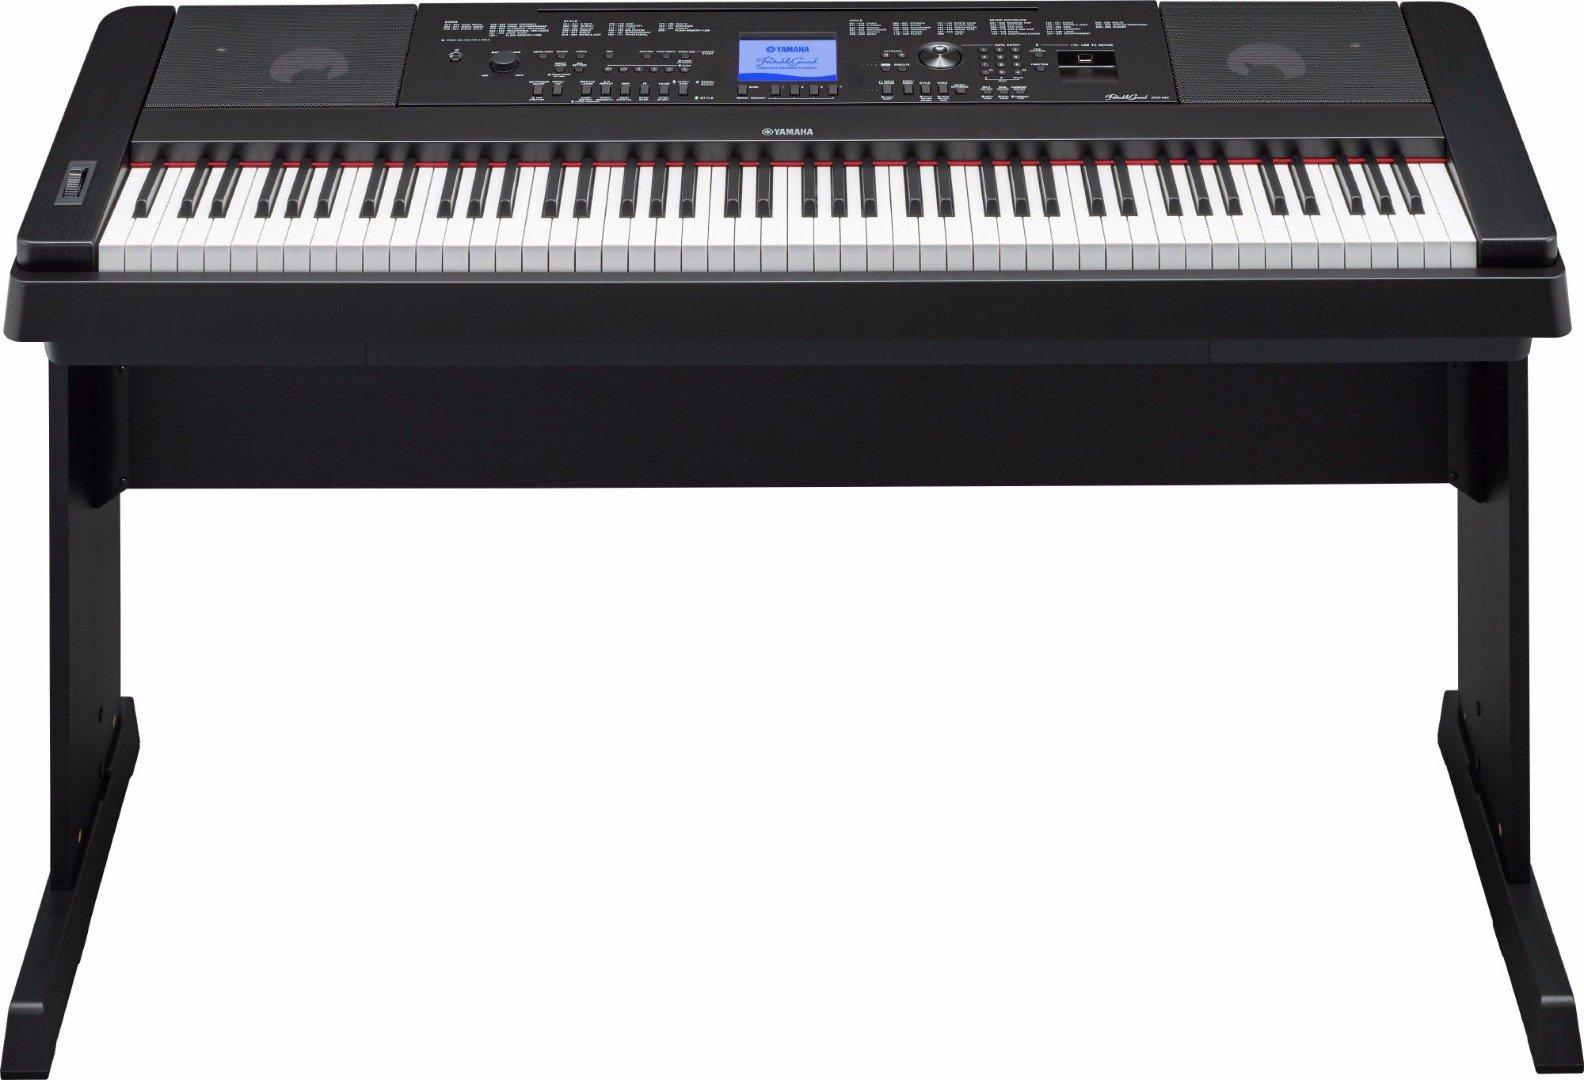 Yamaha DGX-660 Specifications